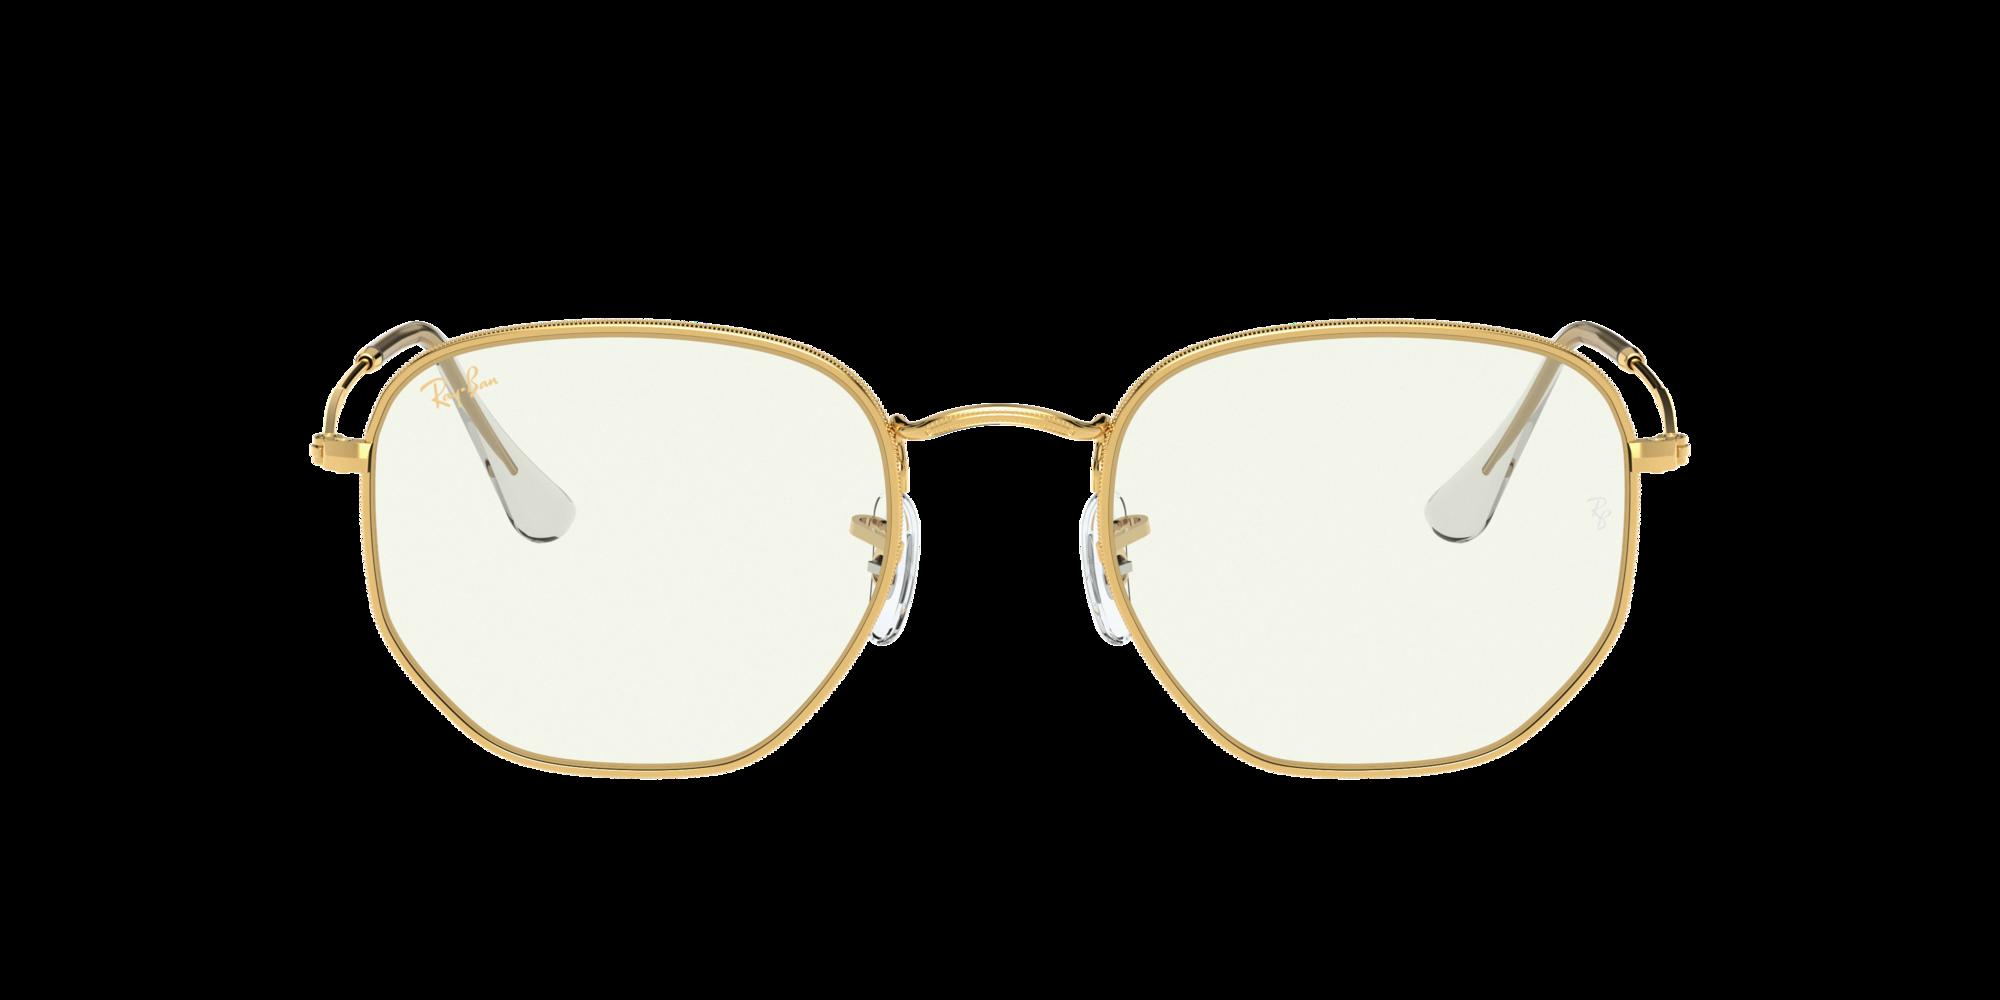 Image for RB3548 51 from LensCrafters | Glasses, Prescription Glasses Online, Eyewear